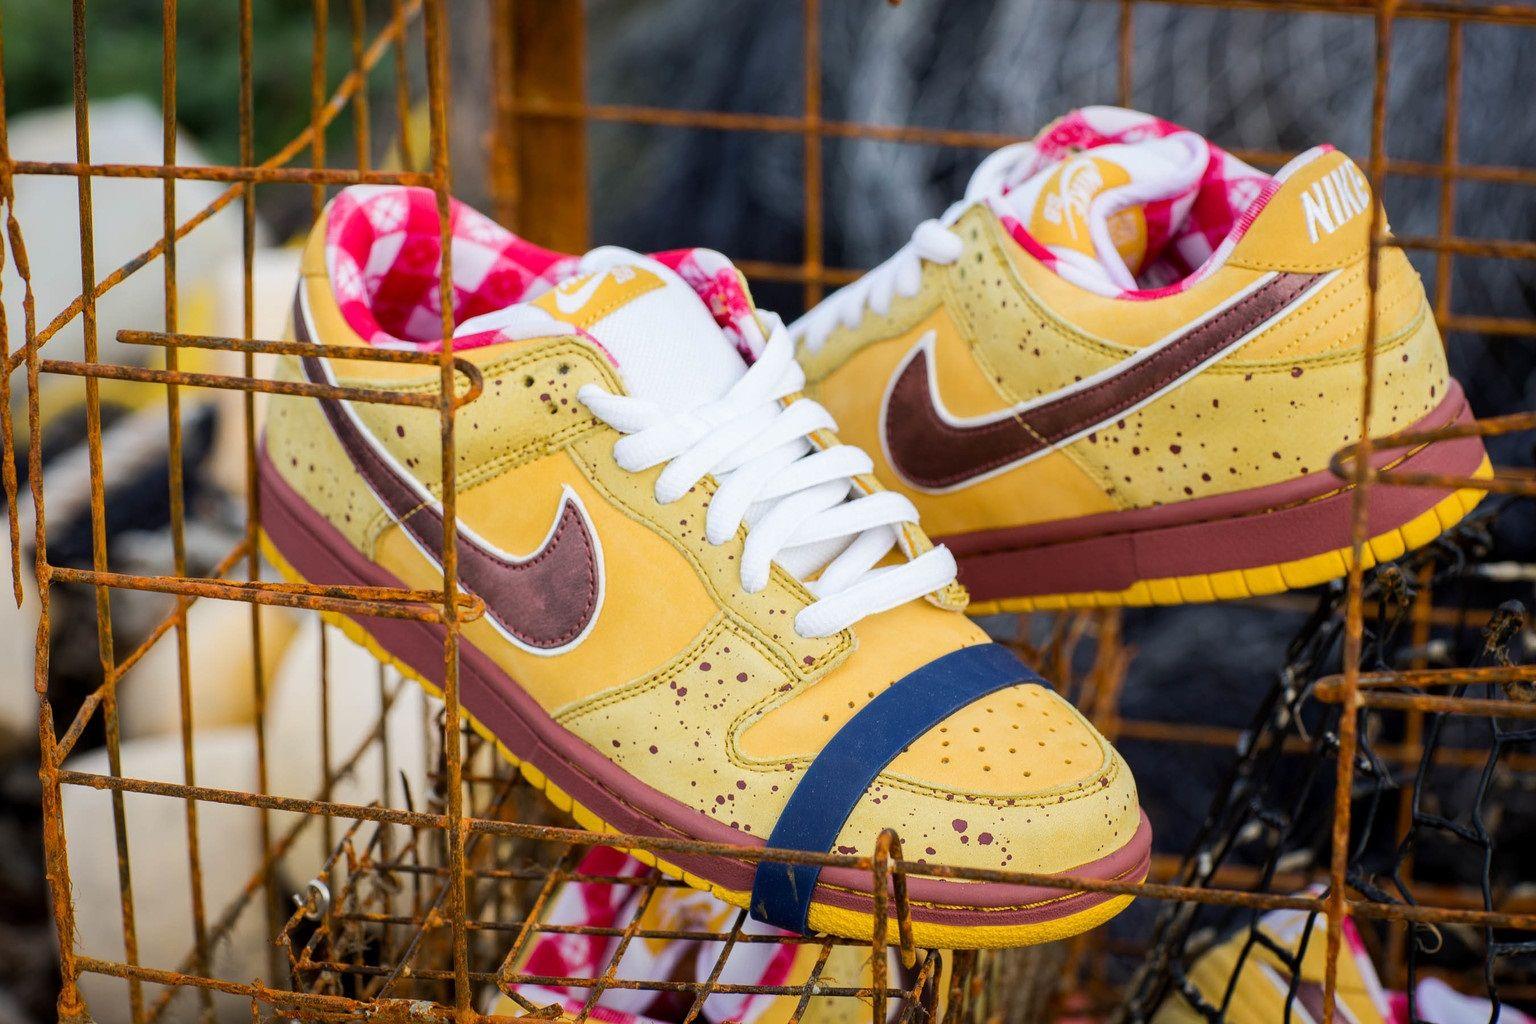 sale retailer 8eaf6 6f051 Nike SB Dunk Low Yellow Lobster